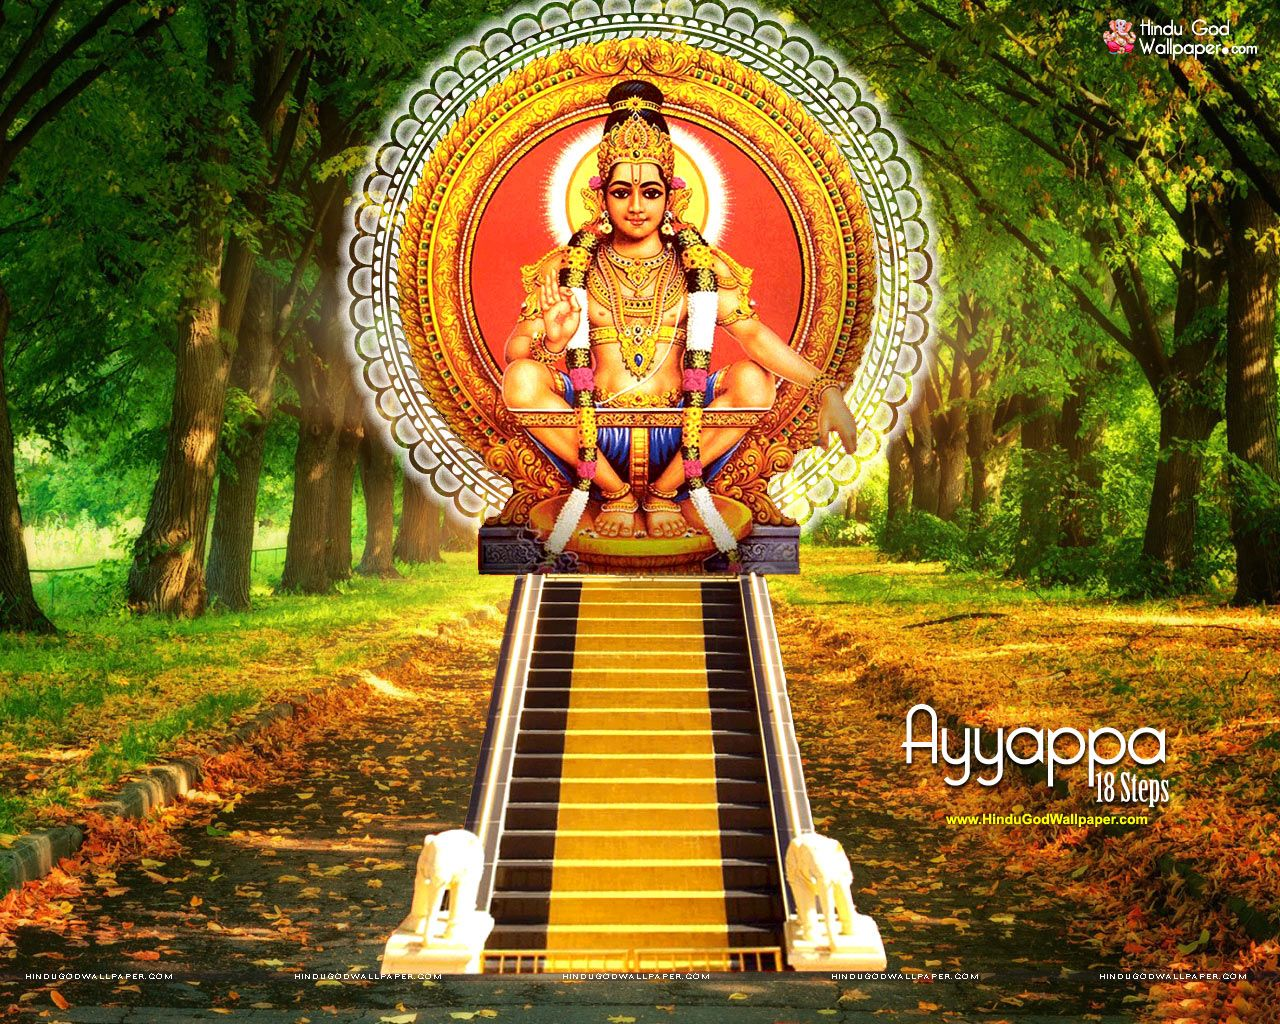 Download Wallpaper High Quality Ayyappan - 31d2100643e1c8c26449027b02fcb089  Trends_569142.jpg